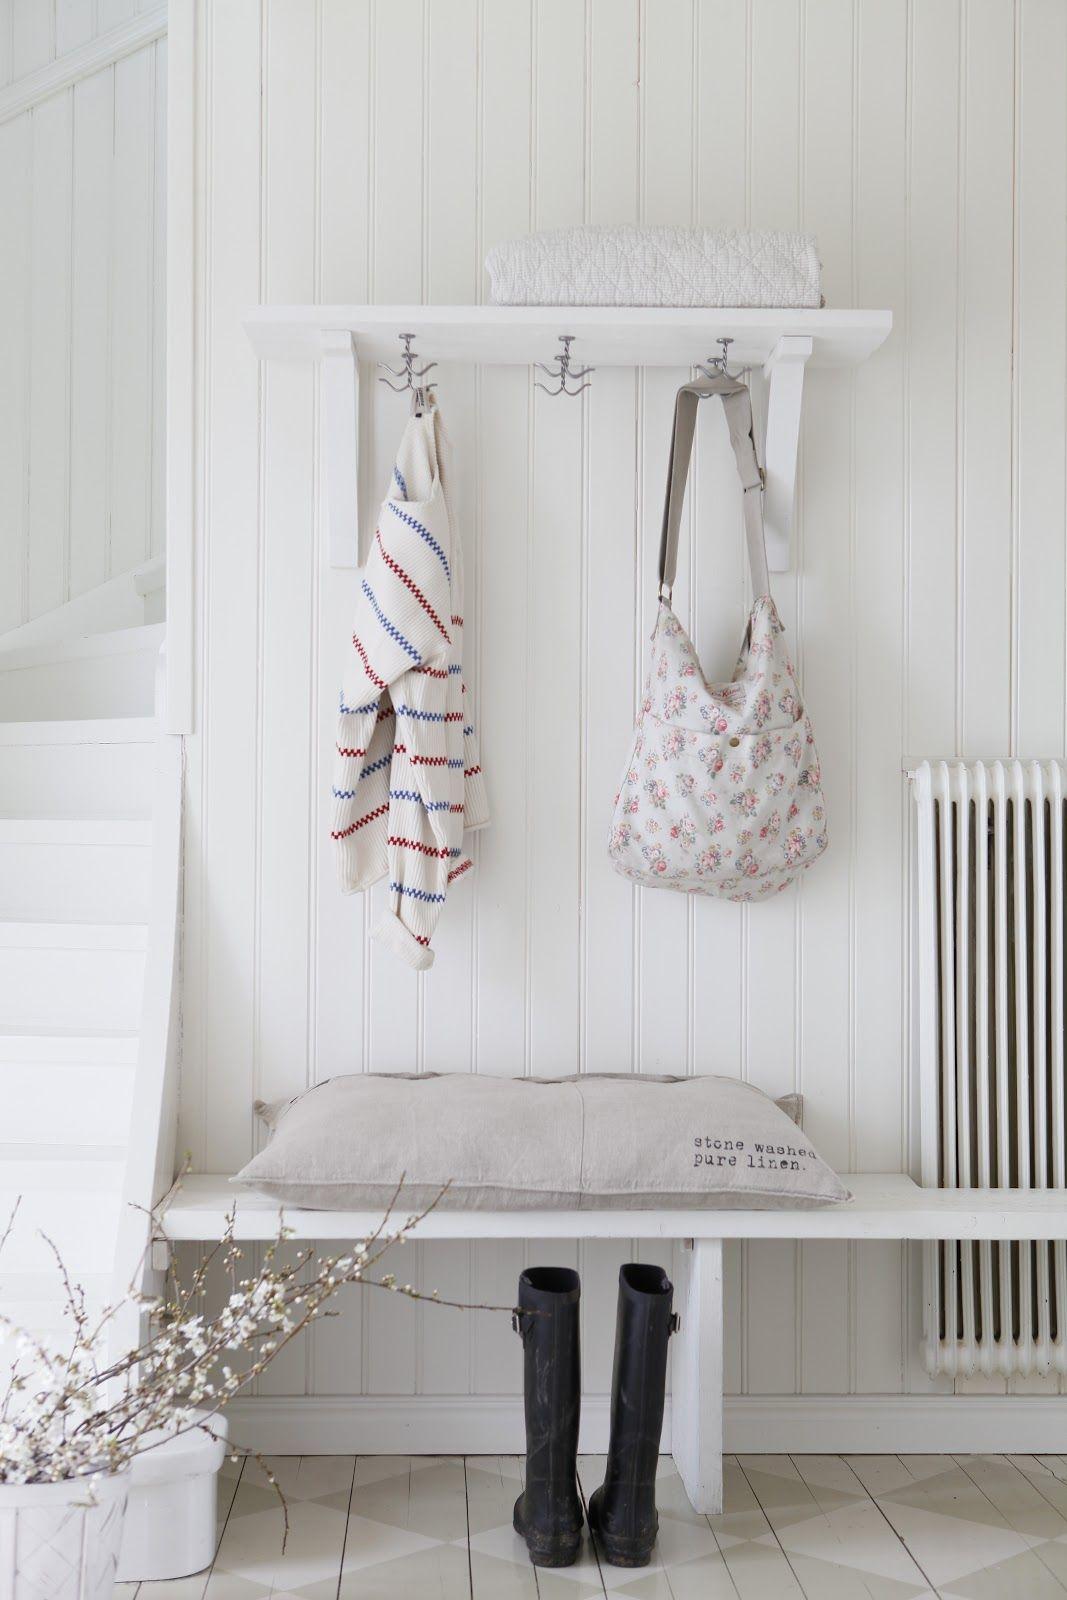 blogg by mildred Country Life in Scandinavia ufe0f Pinterest Inredning, Hus och Hall